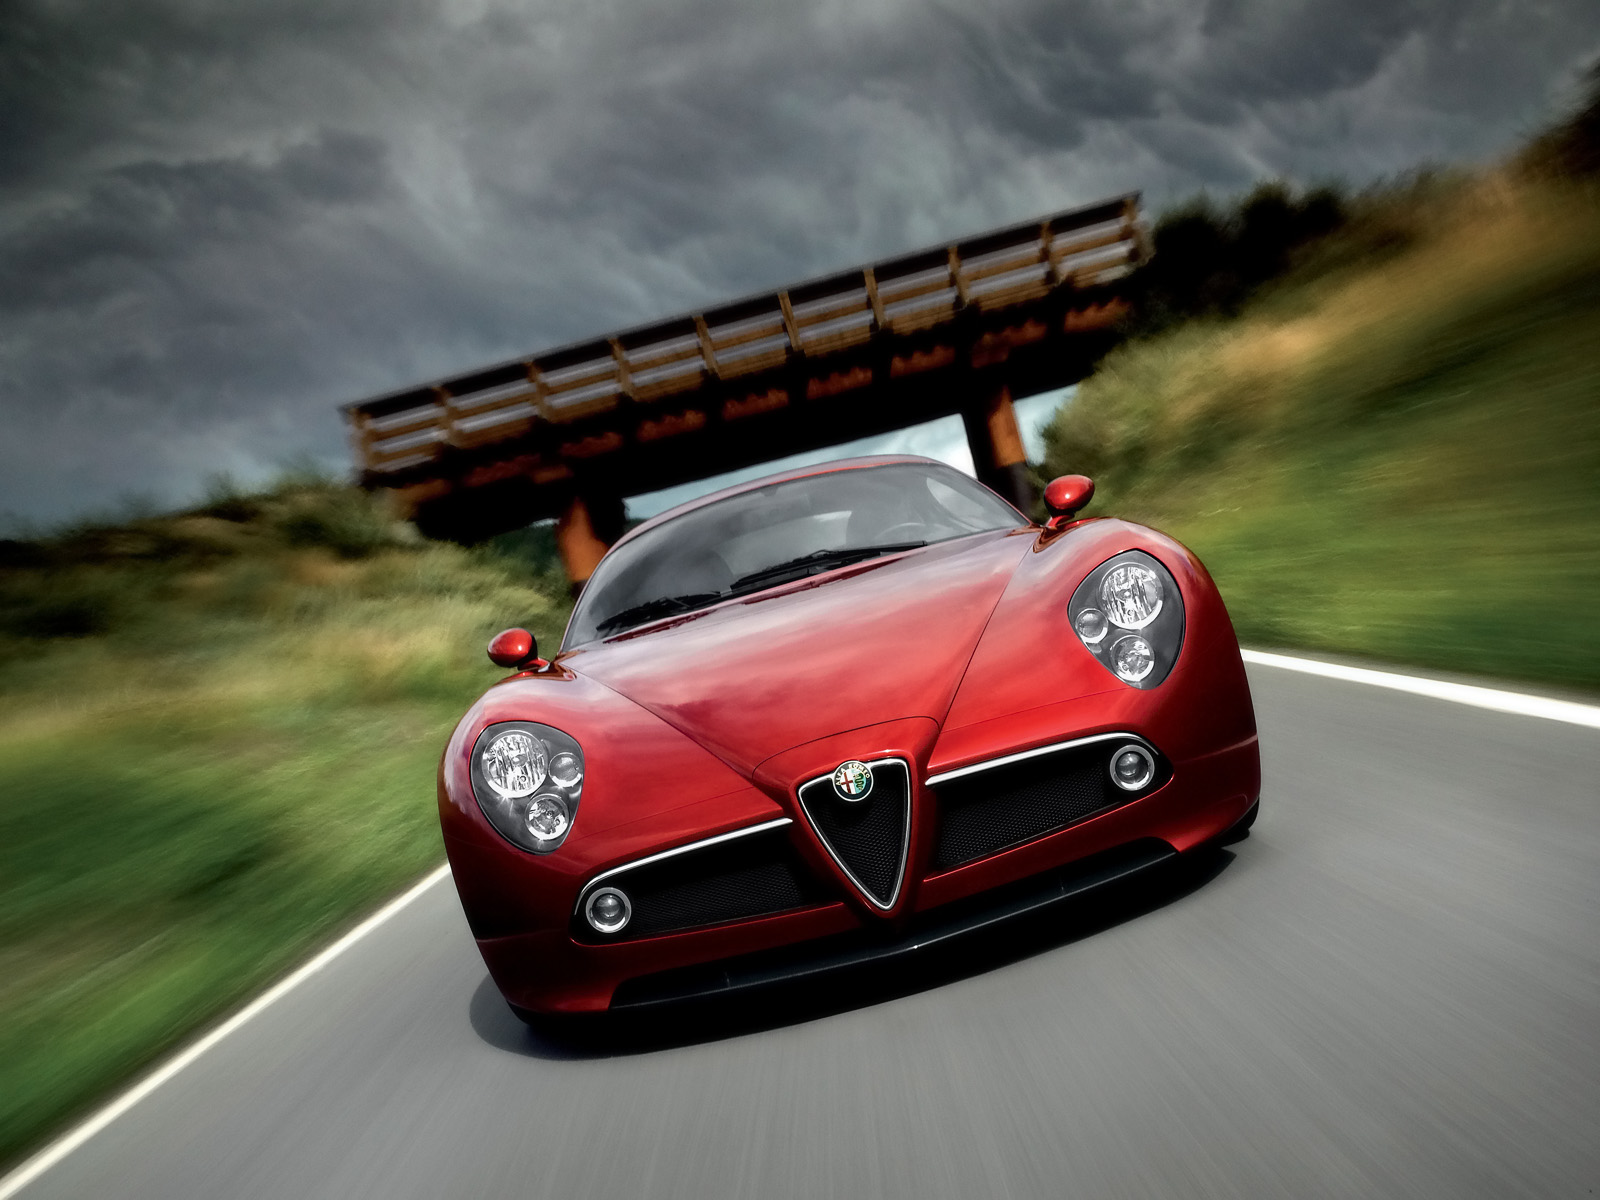 2009 Alfa Romeo 8C Competizione Front Speed Tlit Alfa Romeo 8C Competizione